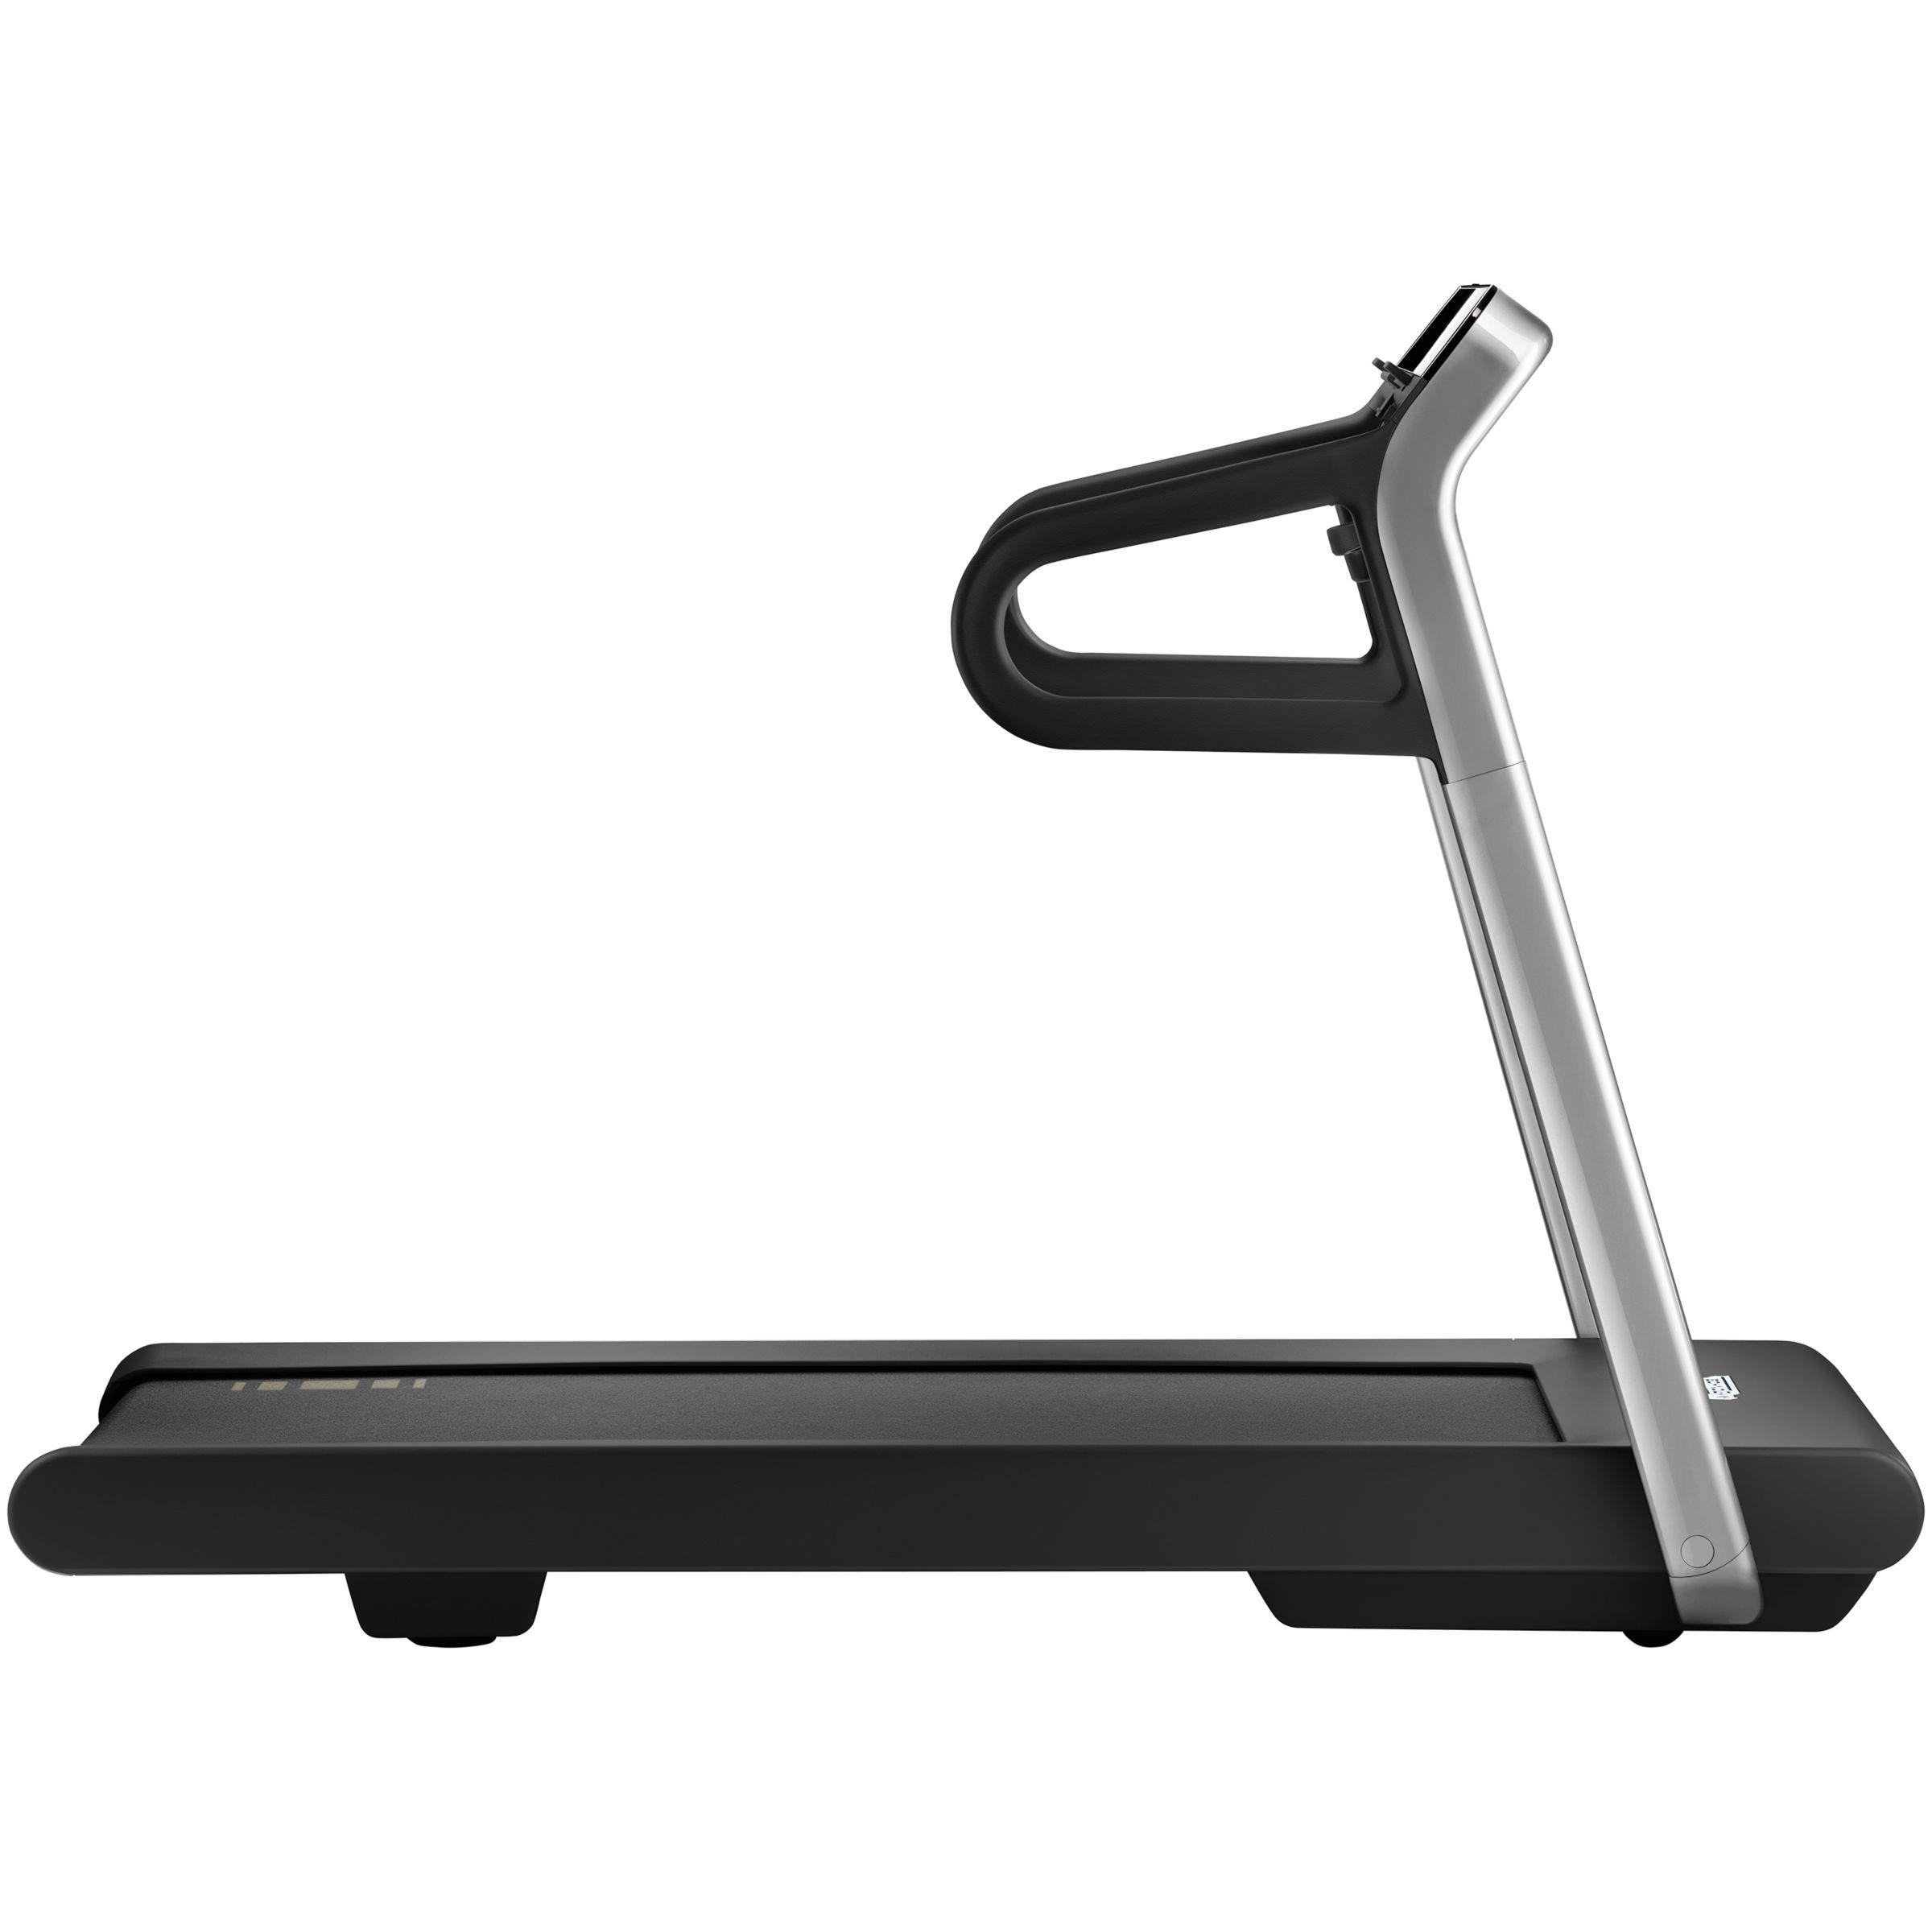 Technogym MYRUN Technogym Treadmill, Cosmo Black